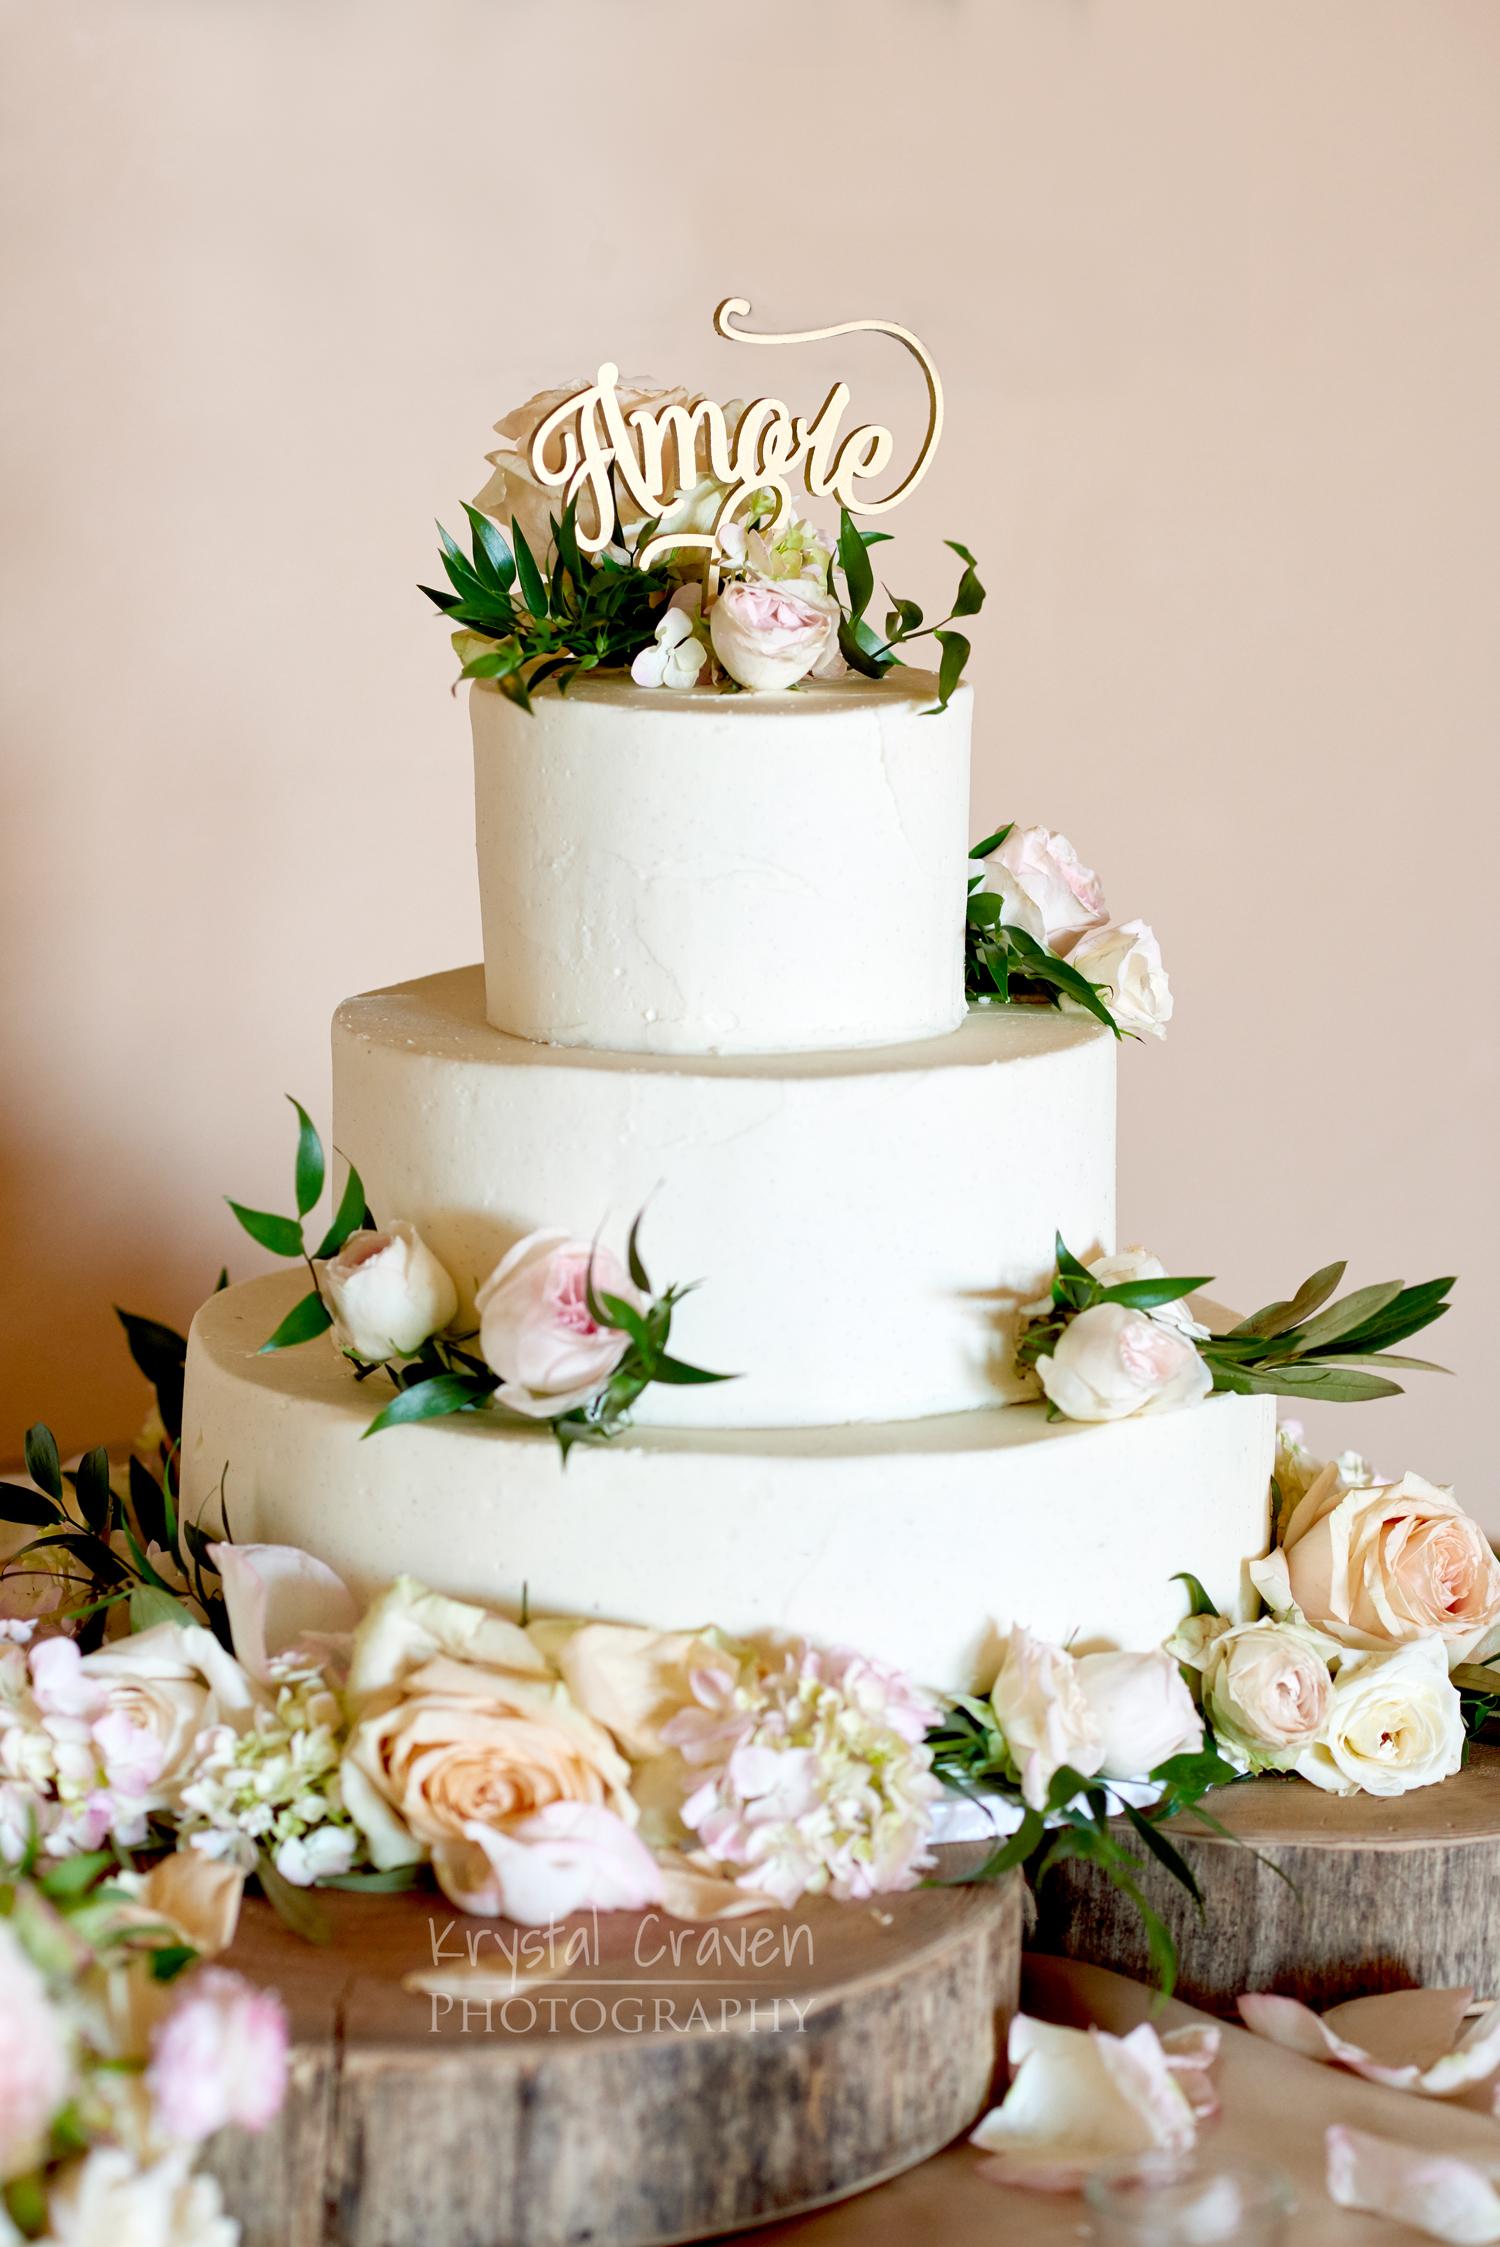 KCP Wedding Cake Image